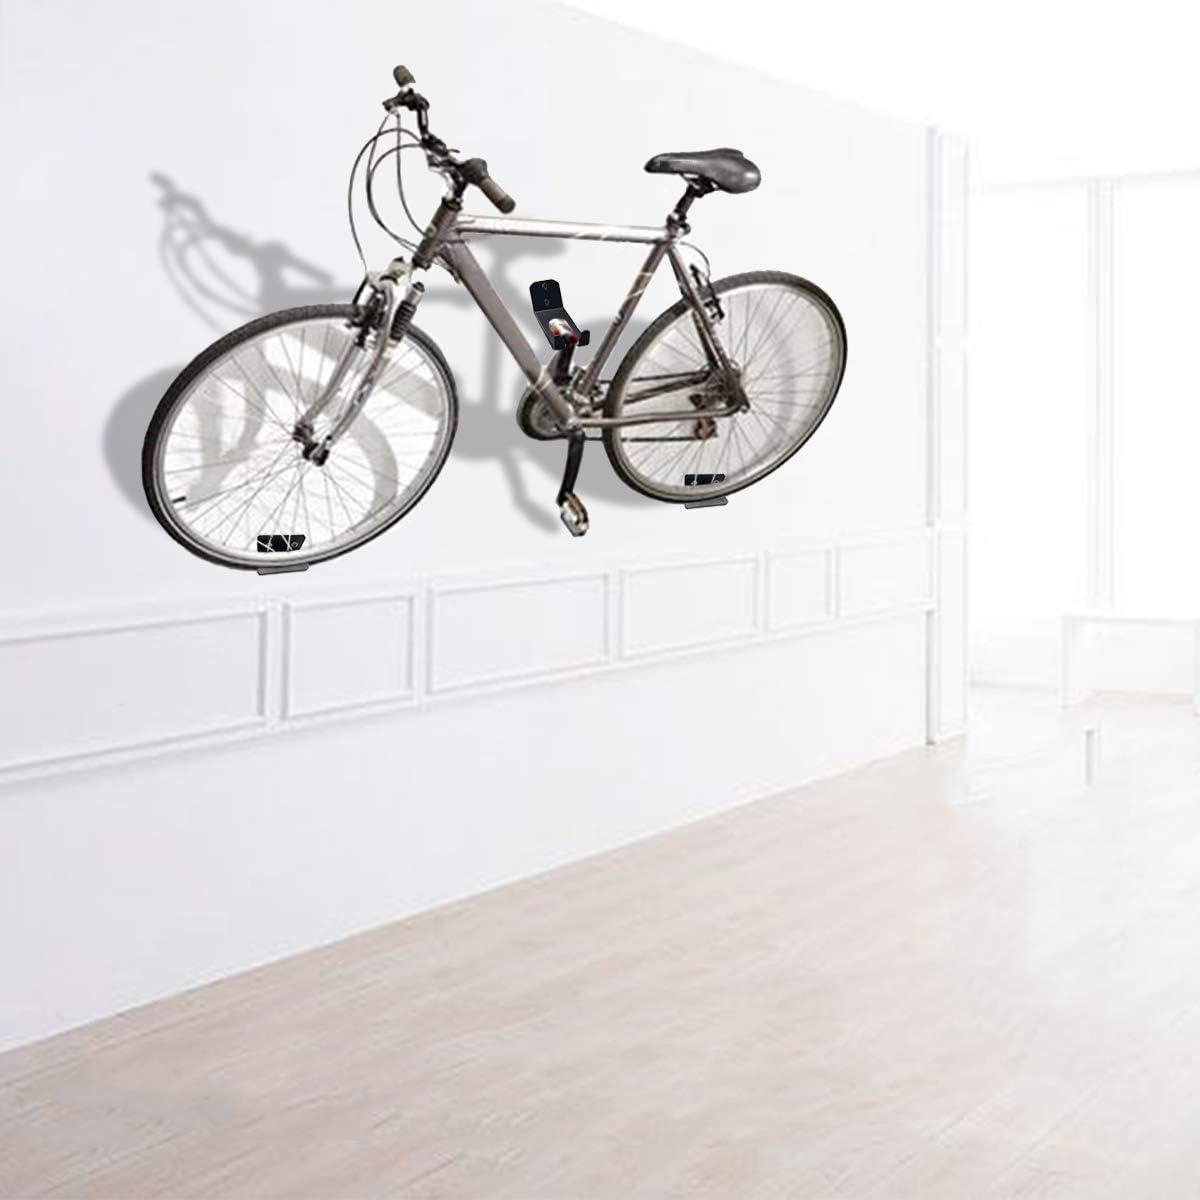 Amazon.com: Qualward Bike Rack Wall Mount Bicycle Cycling ...